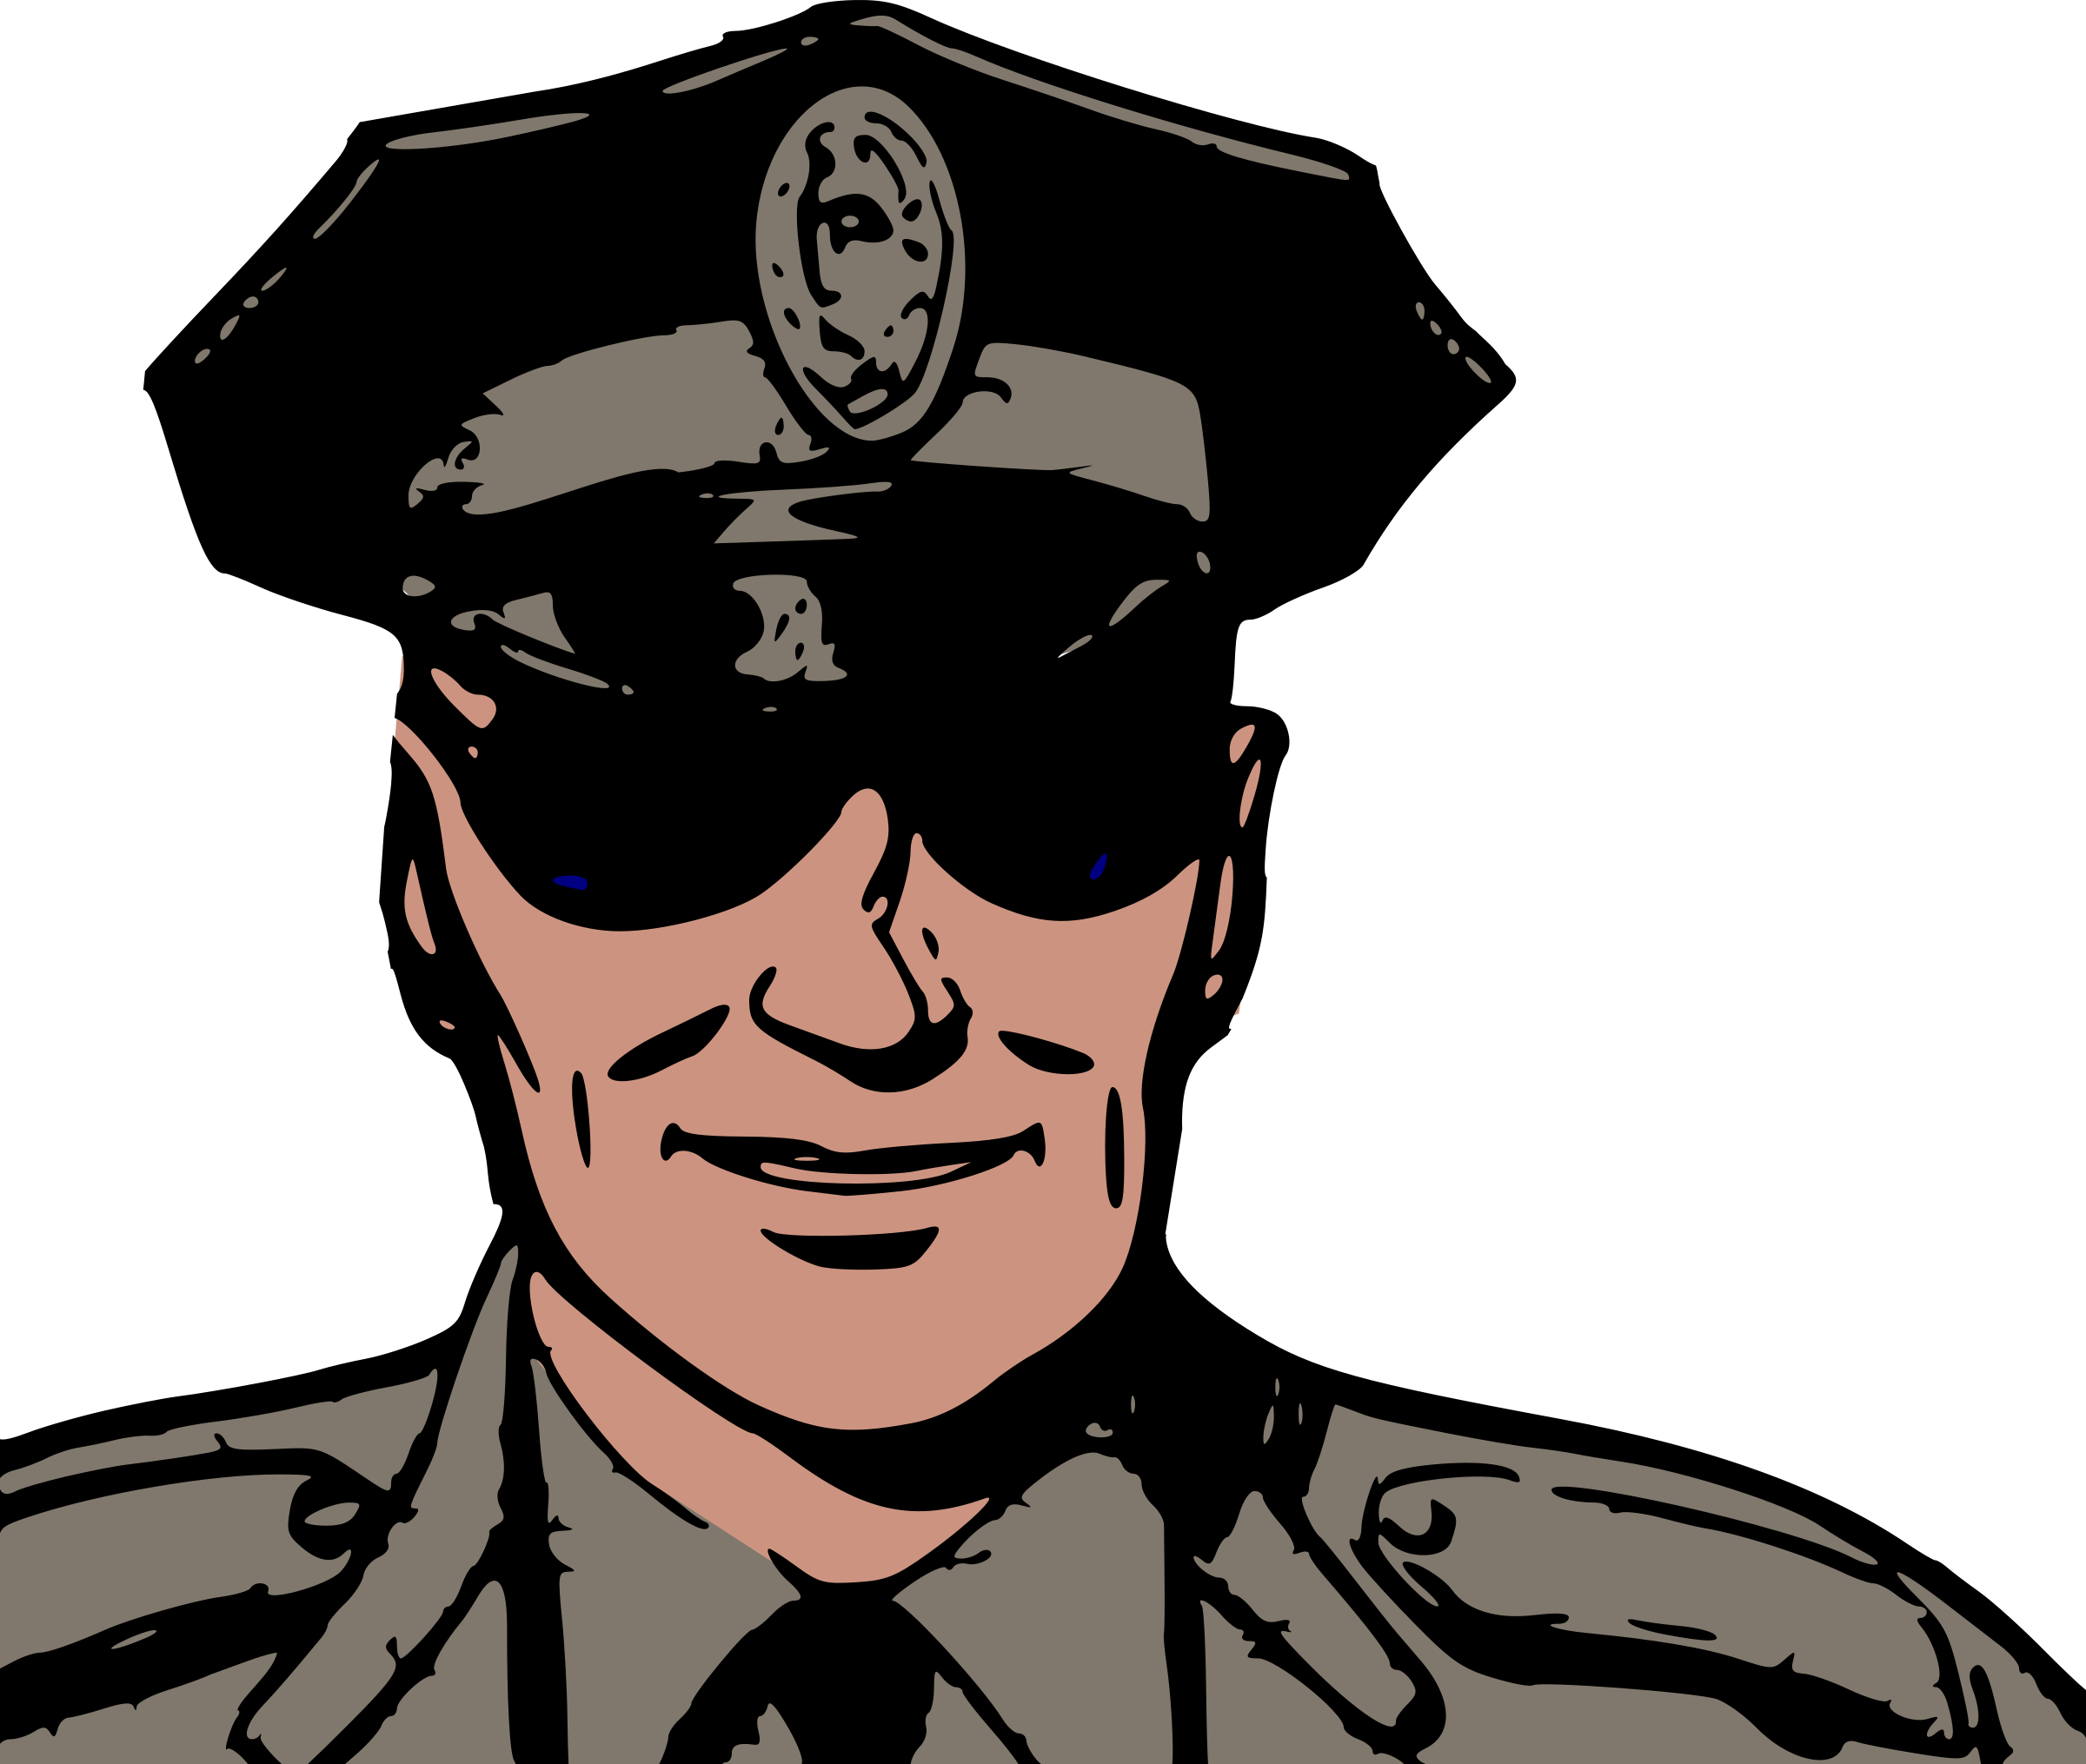 Police retro